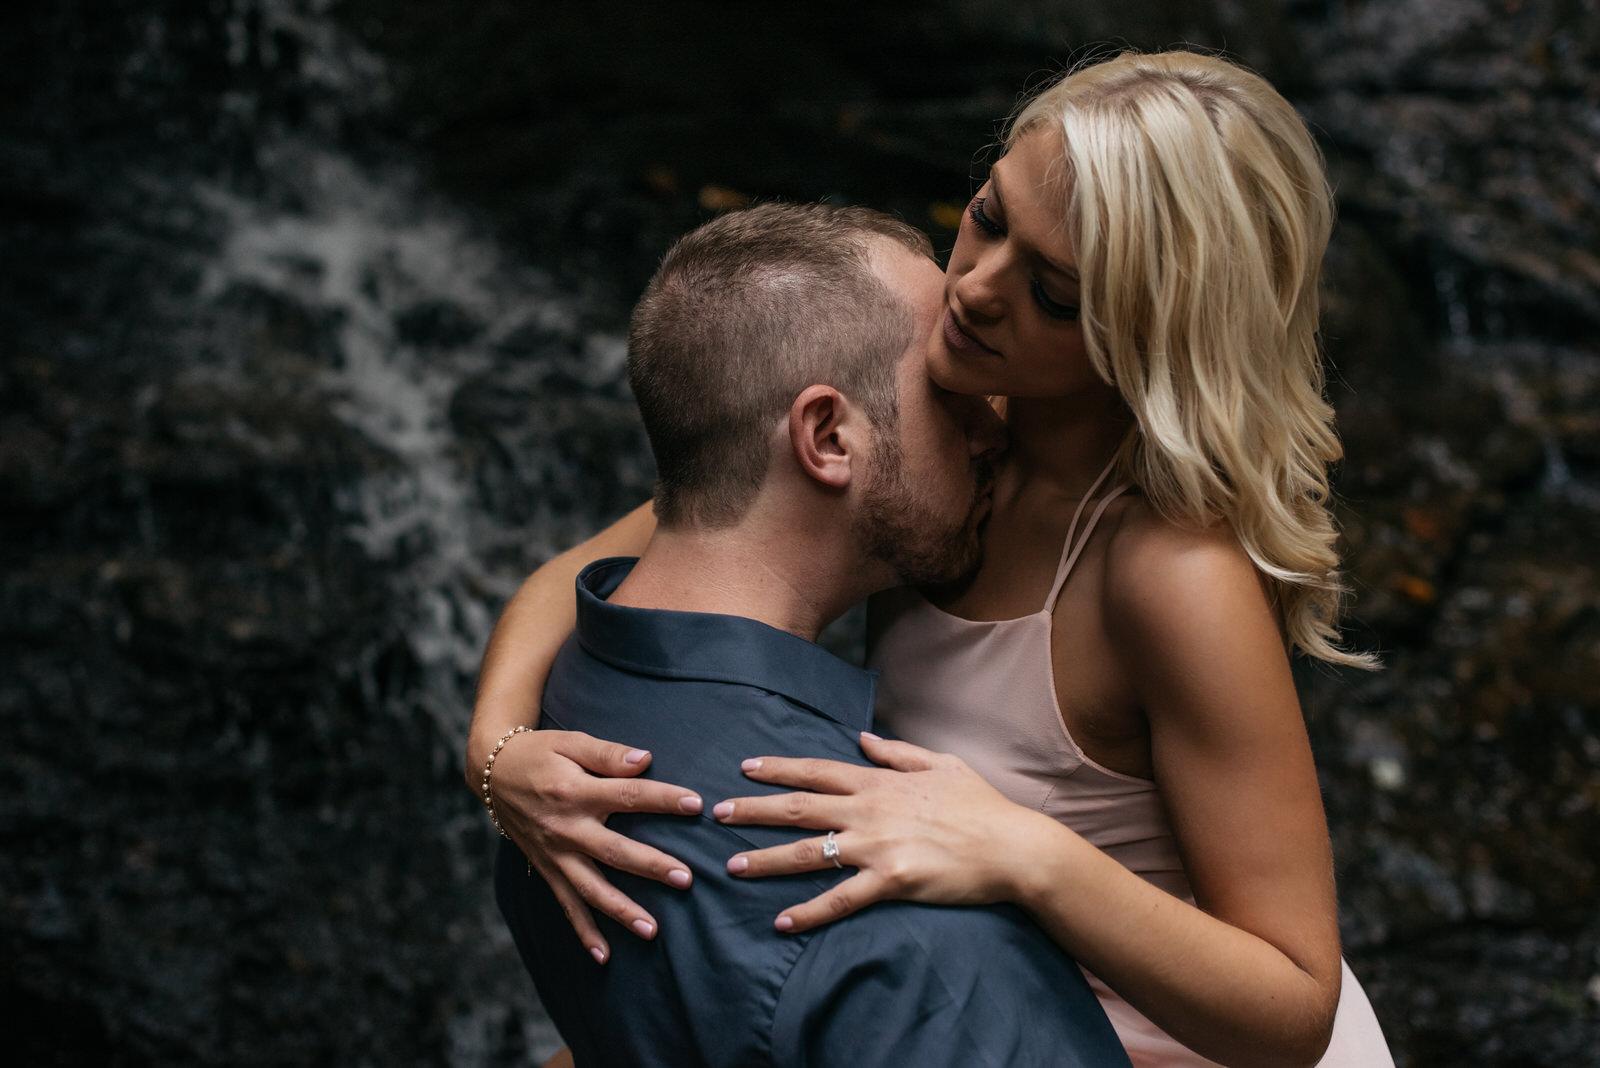 McConnells-Mill-Engagement-Photos-18.jpg